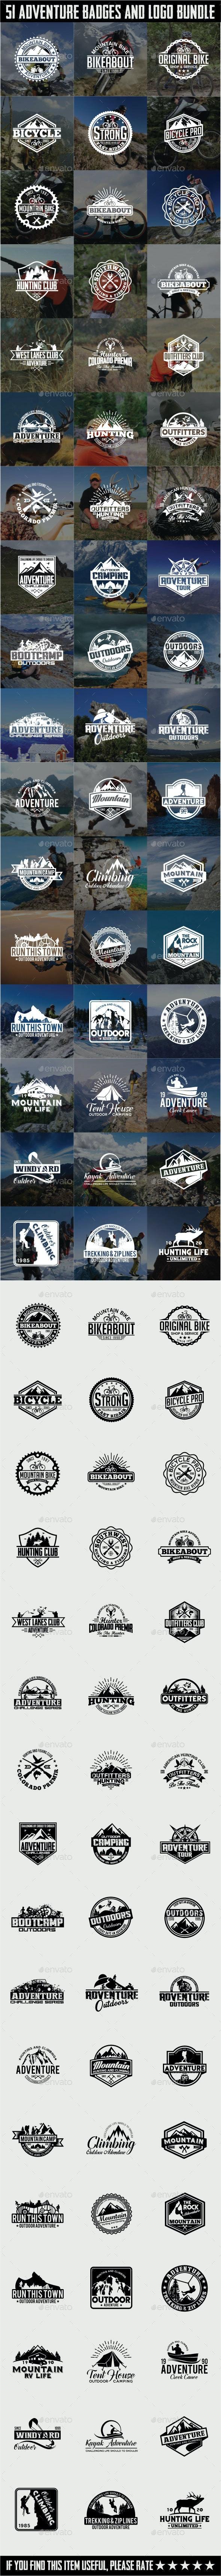 51 Adventure Badges and Logos Bundle - Badges & Stickers Web Elements